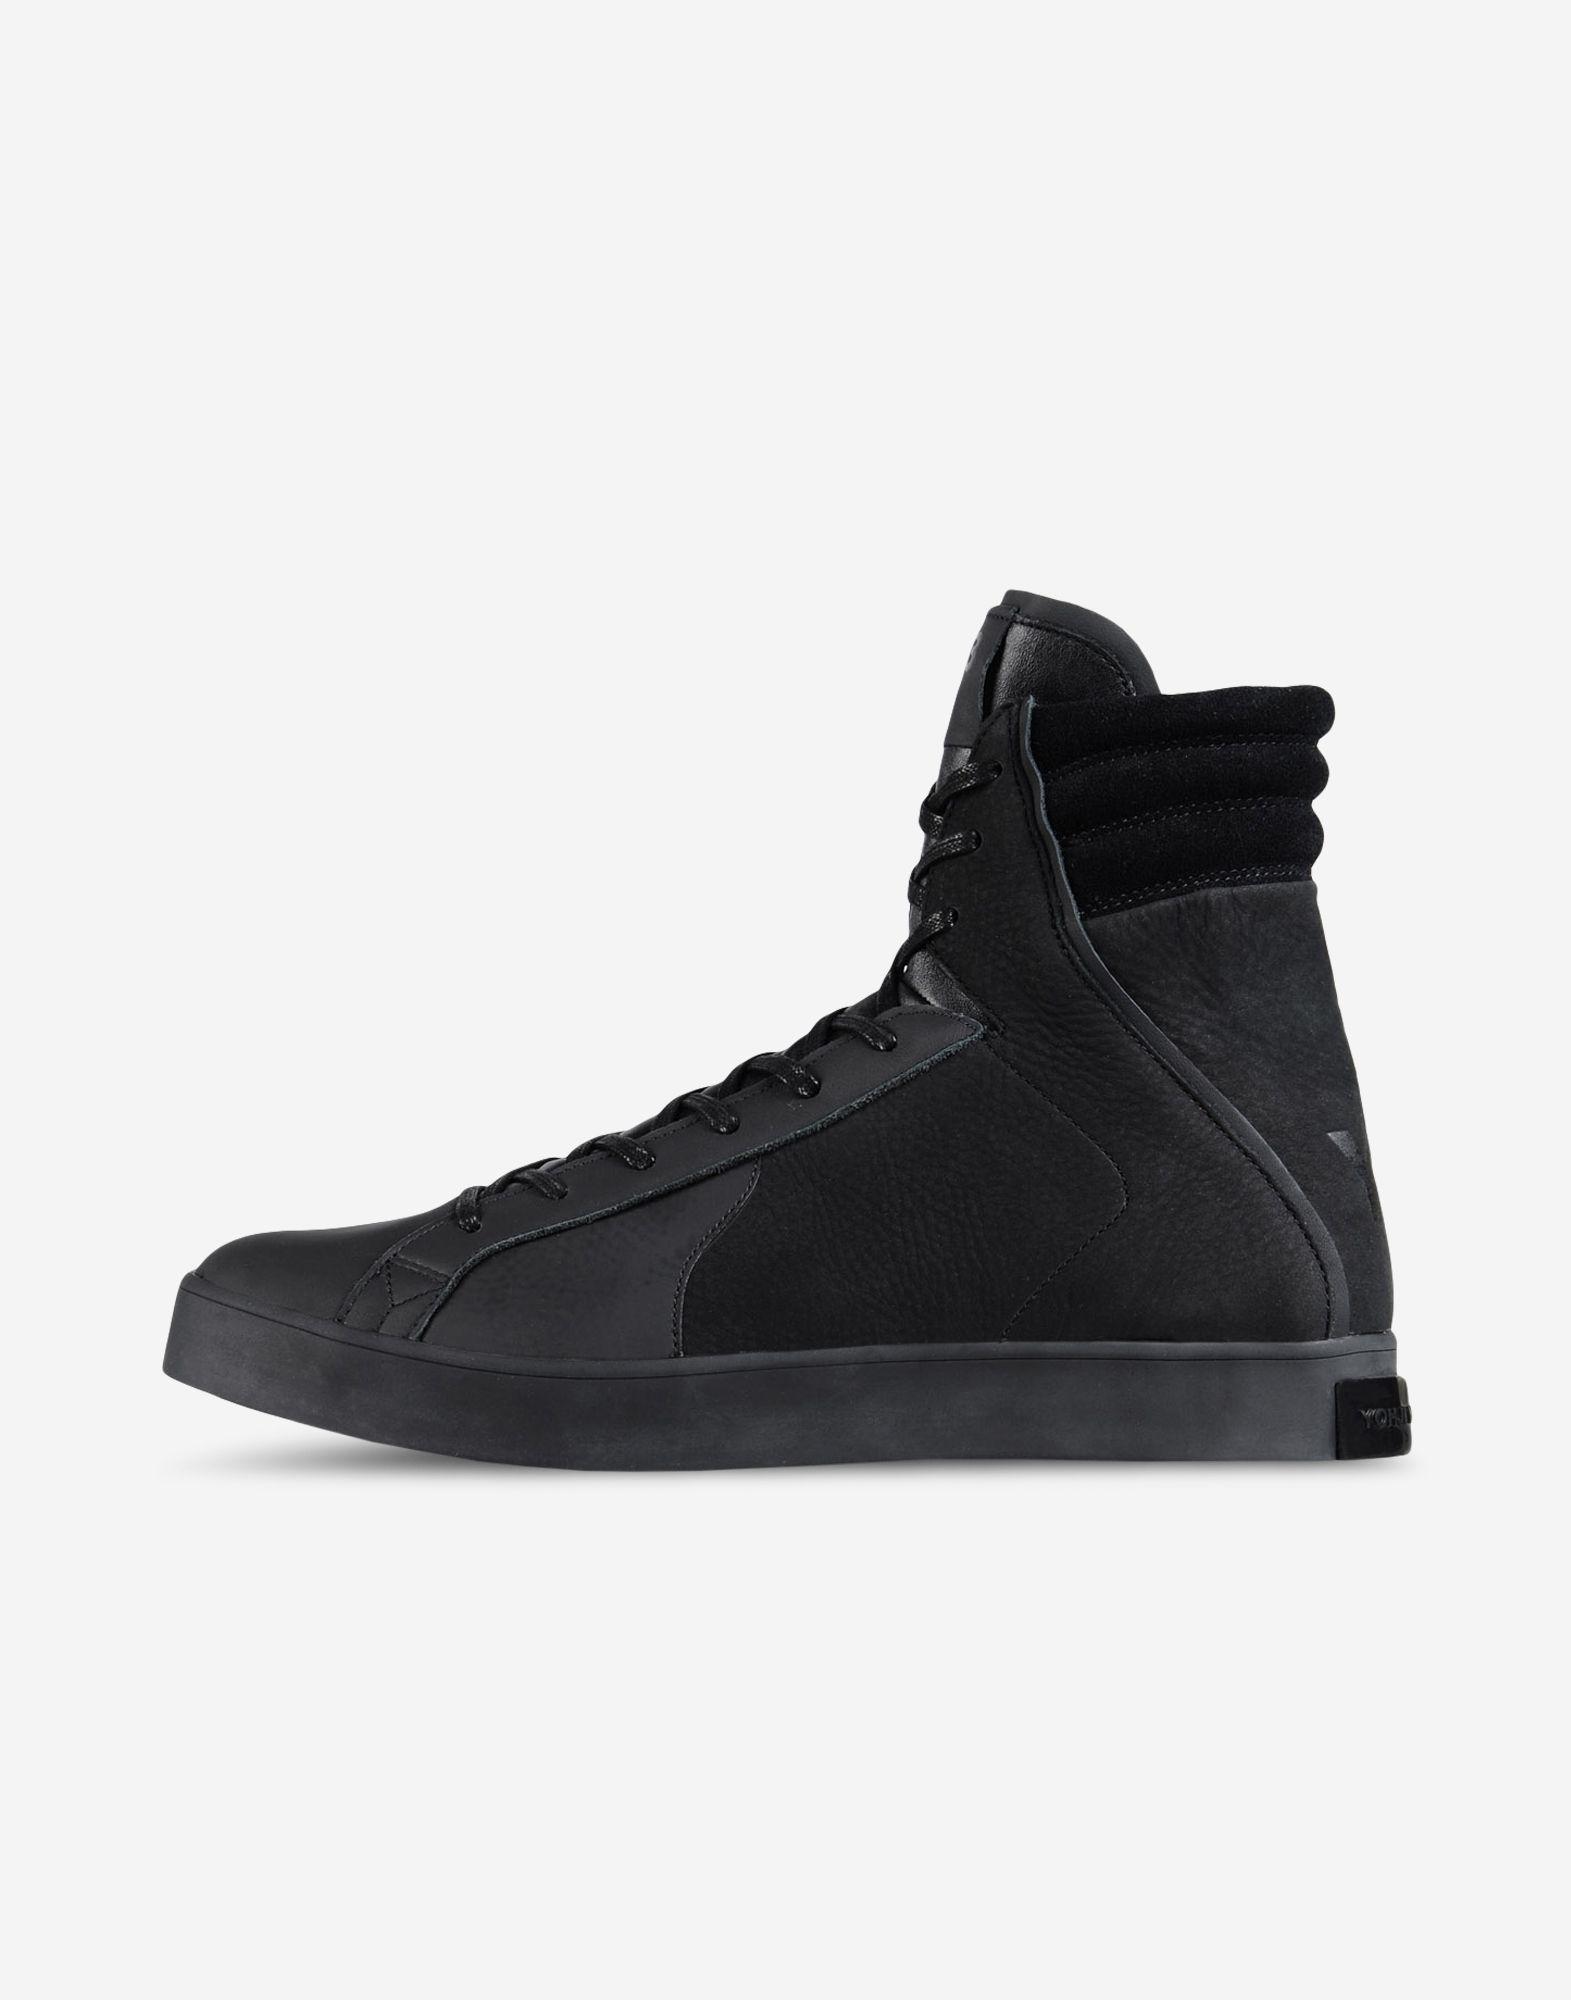 Acquista adidas sneakers alte uomo  01a61c430e7